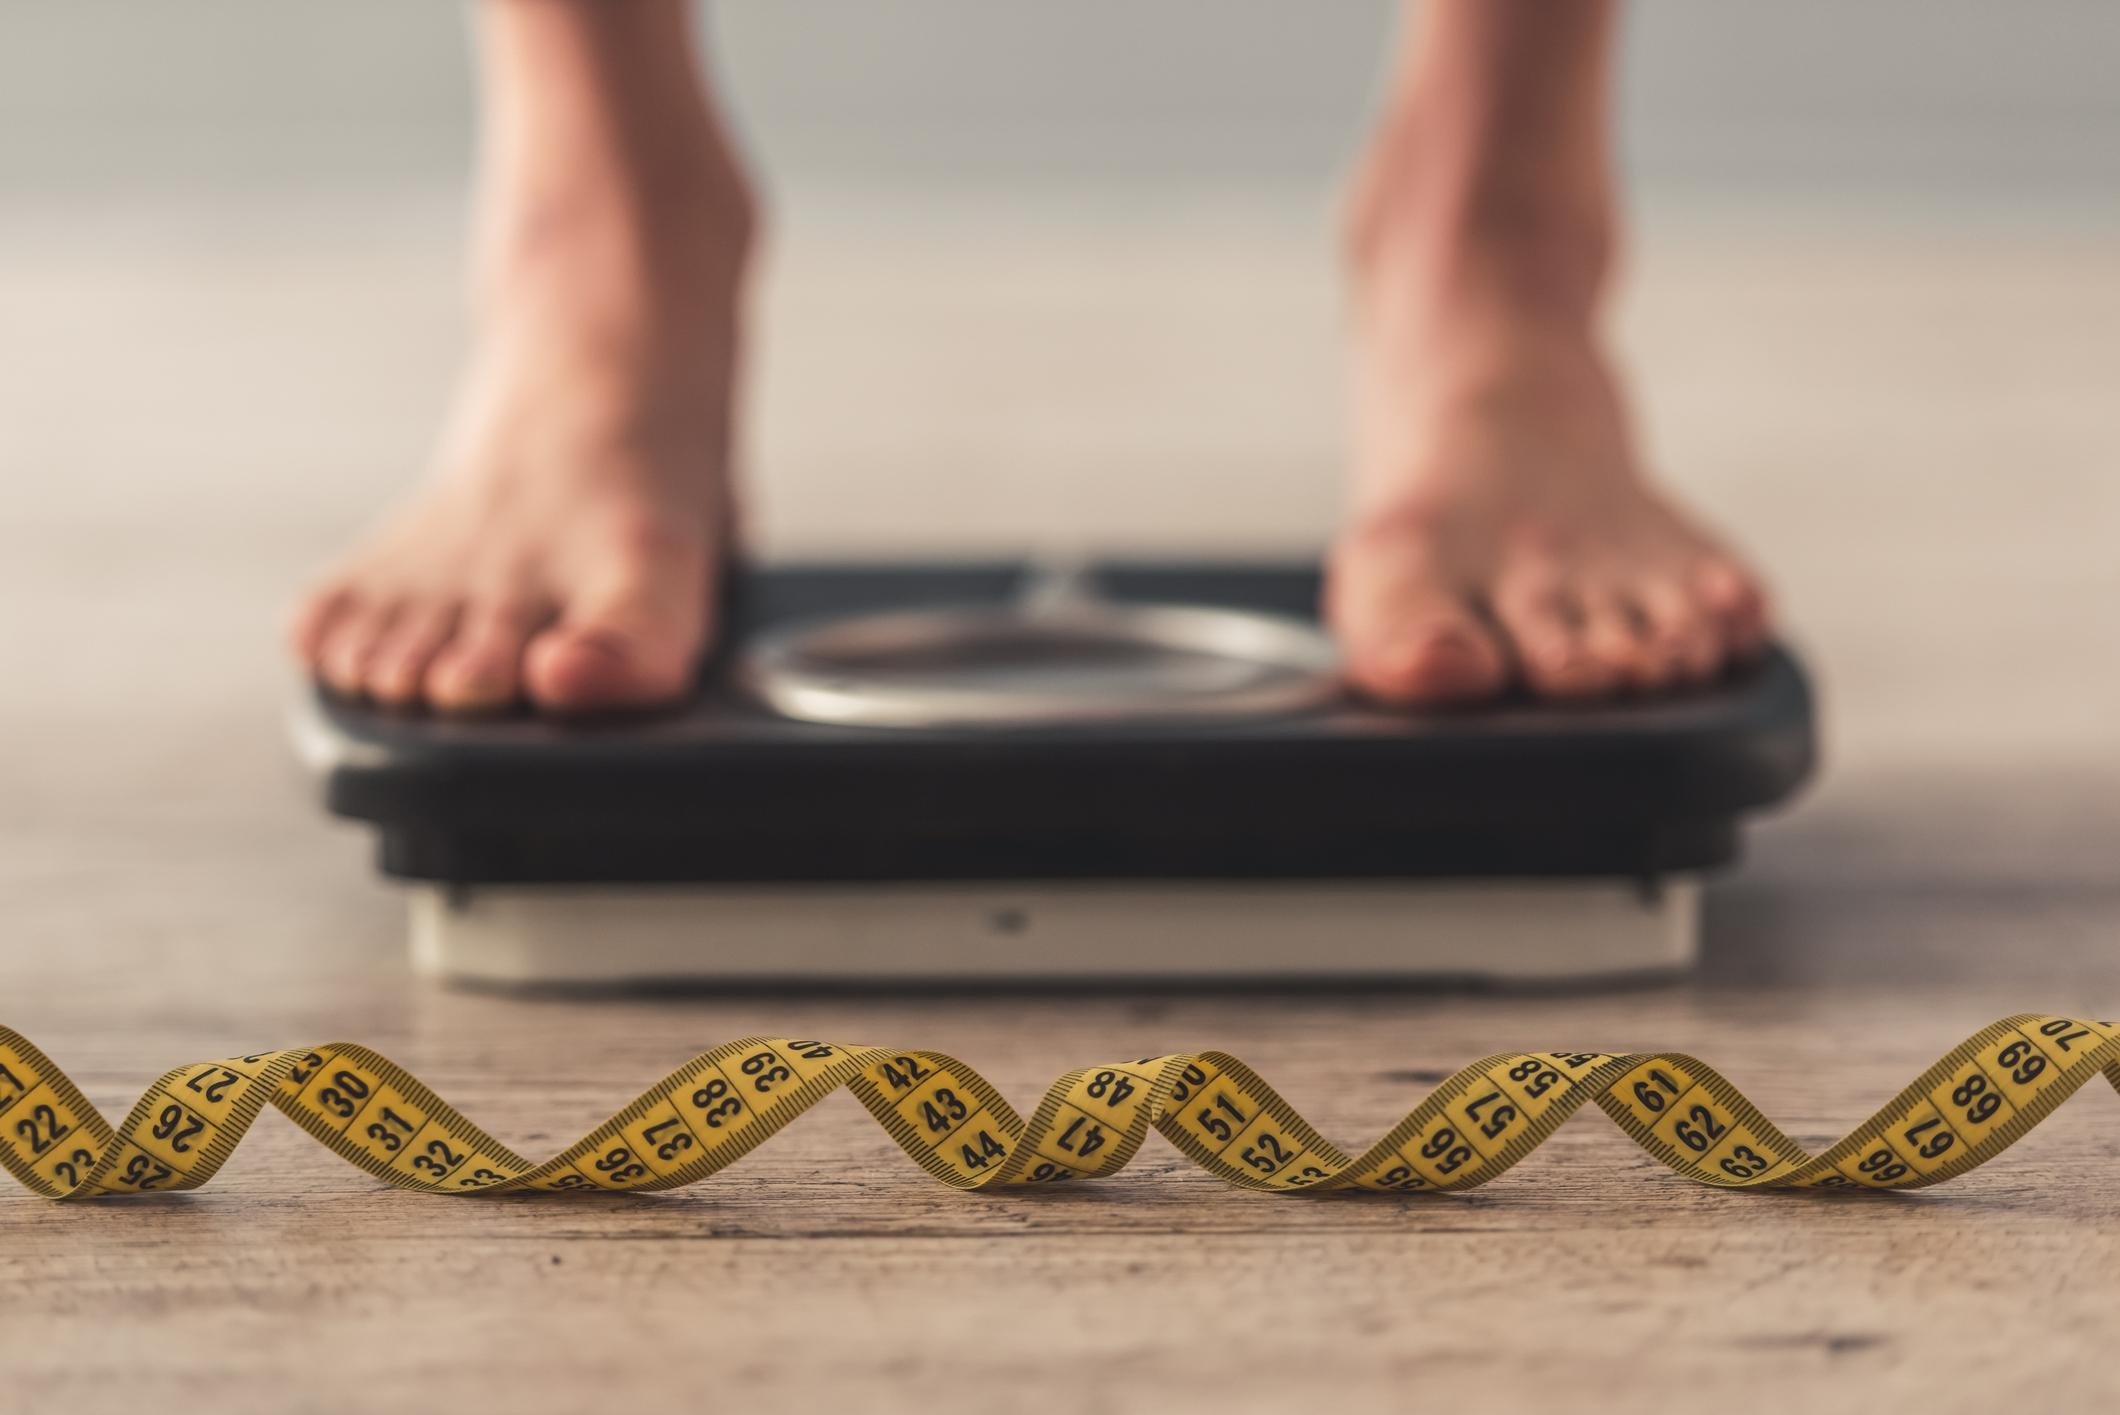 pierdere in greutate sbd